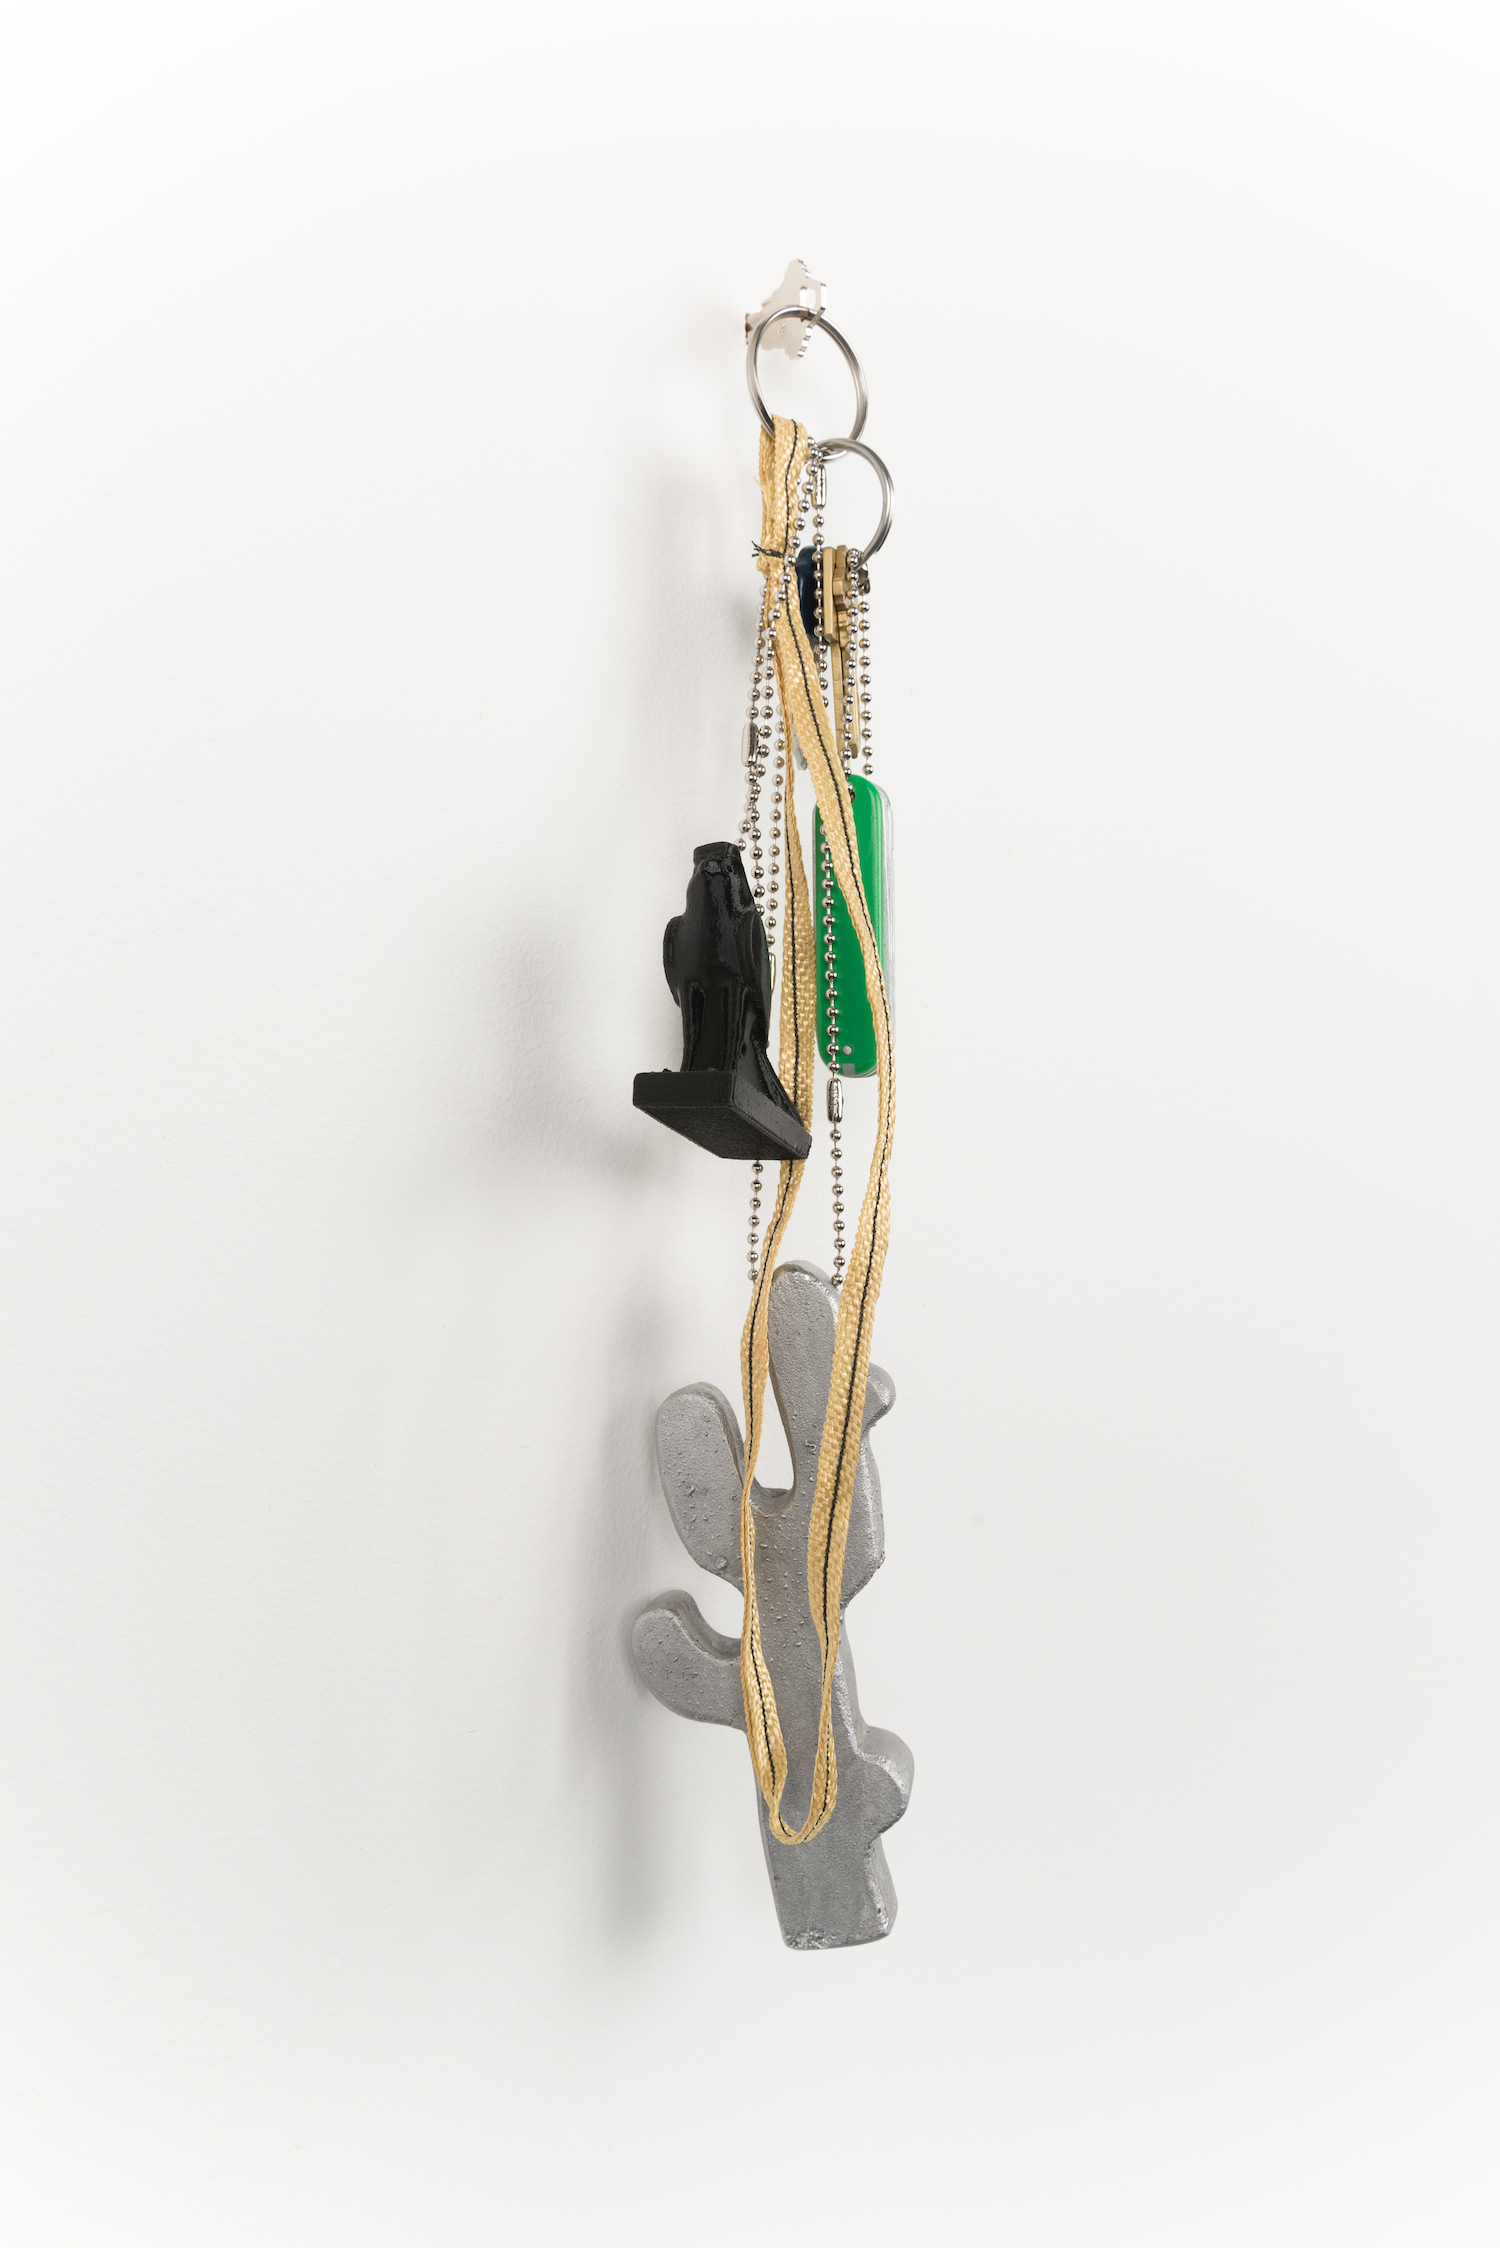 Chris Bradley  Token (Cactus)  2013 Cast aluminum, wood, PLA, Kevlar, key rings, chain 17h x 4w x 3d in CB054